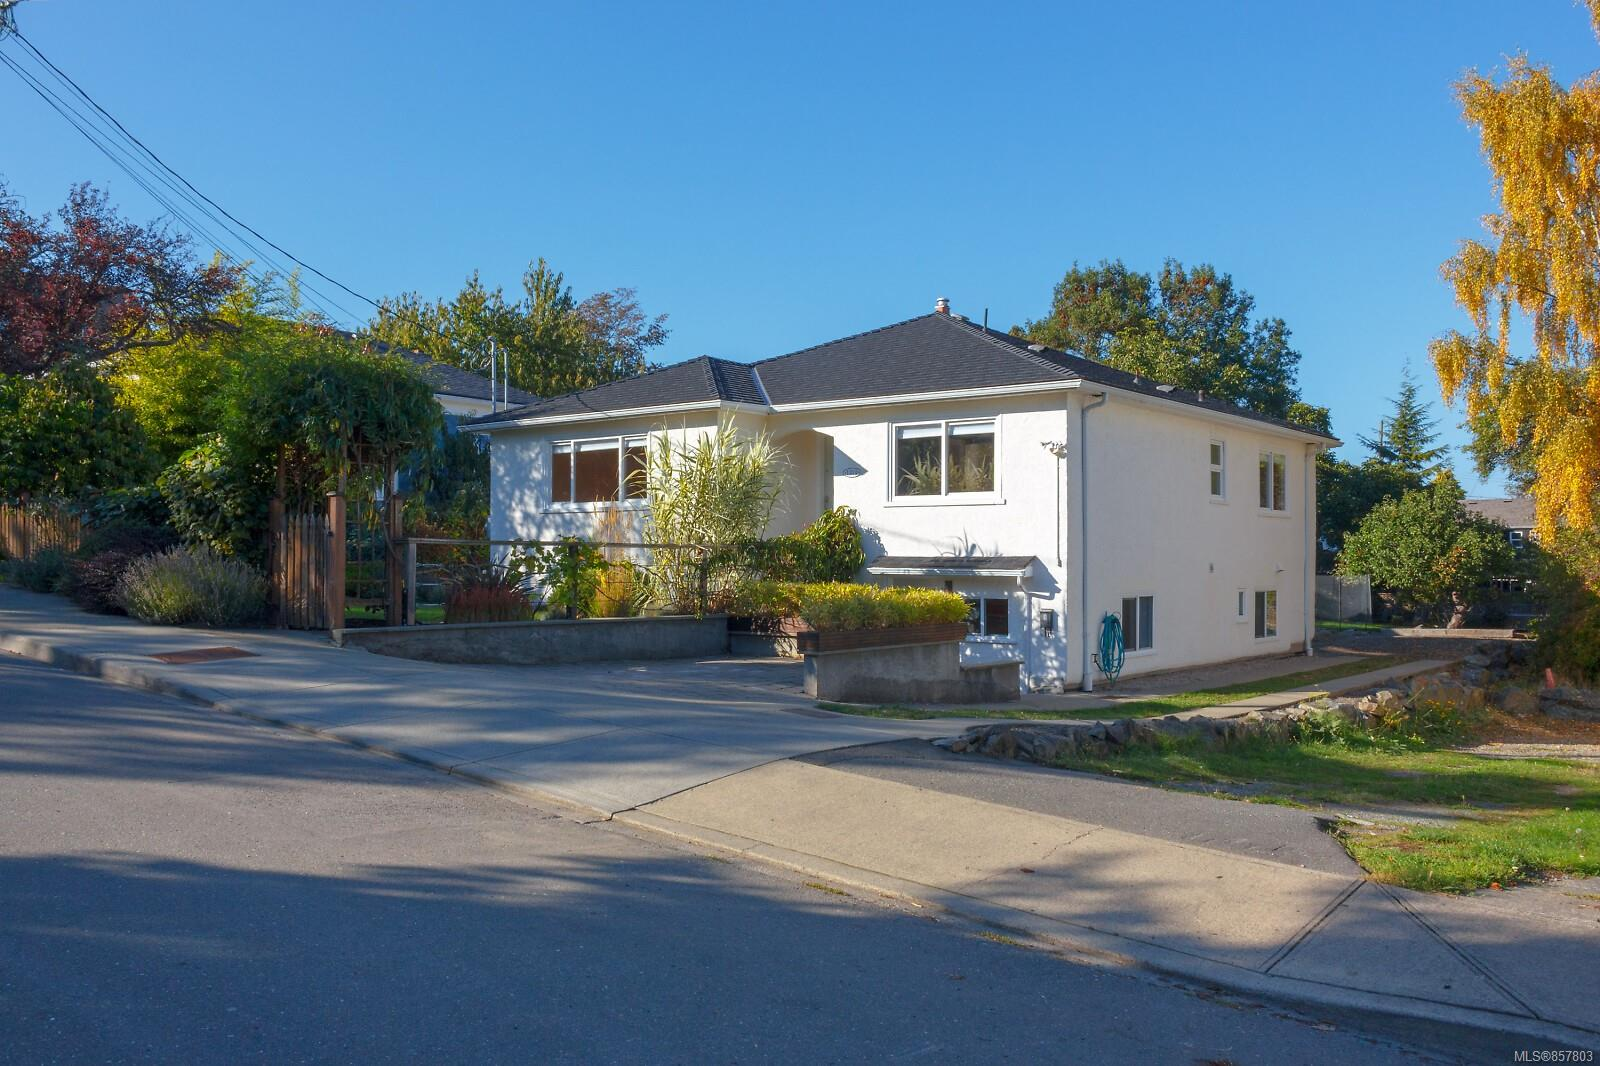 Photo 0 at 1314 Balmoral Road, Fernwood, Victoria